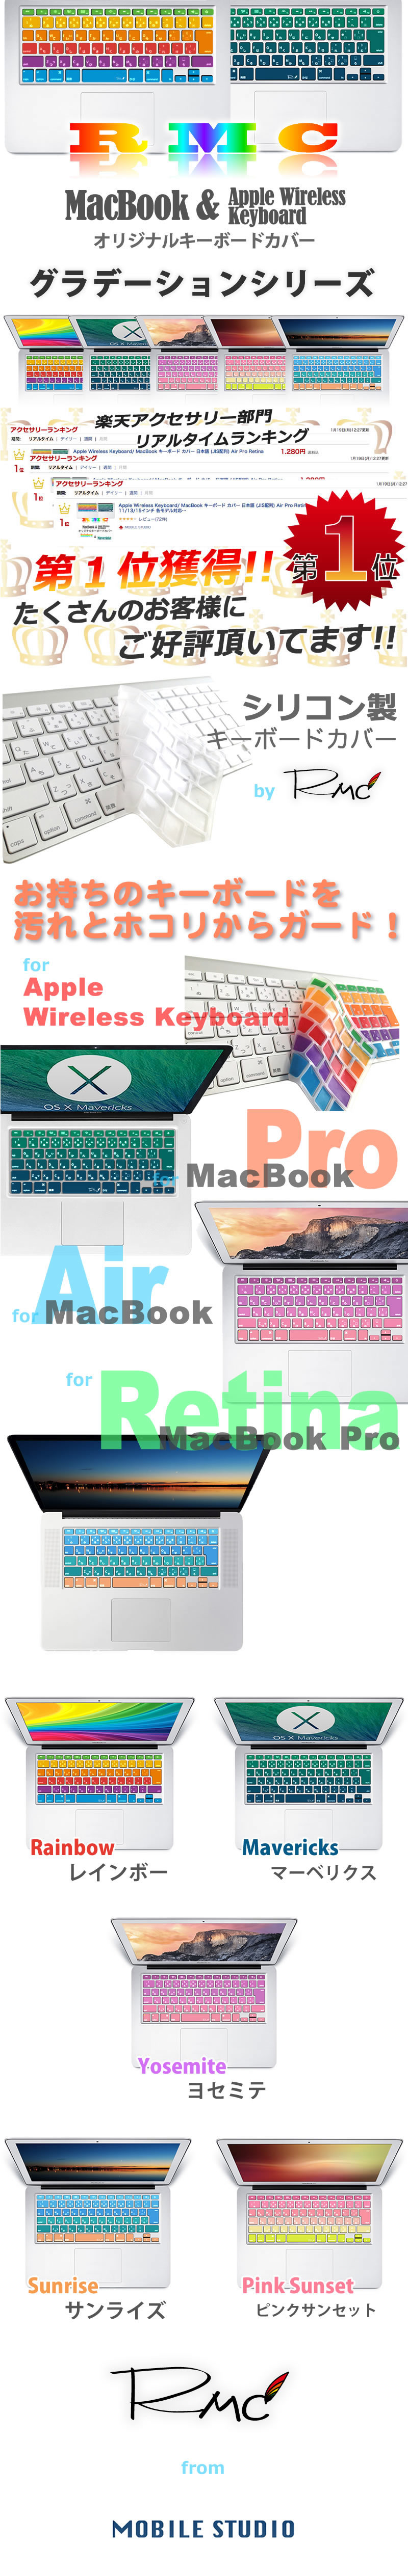 RMC���ꥸ�ʥ� macbook mac �����ܡ��ɥ��С�